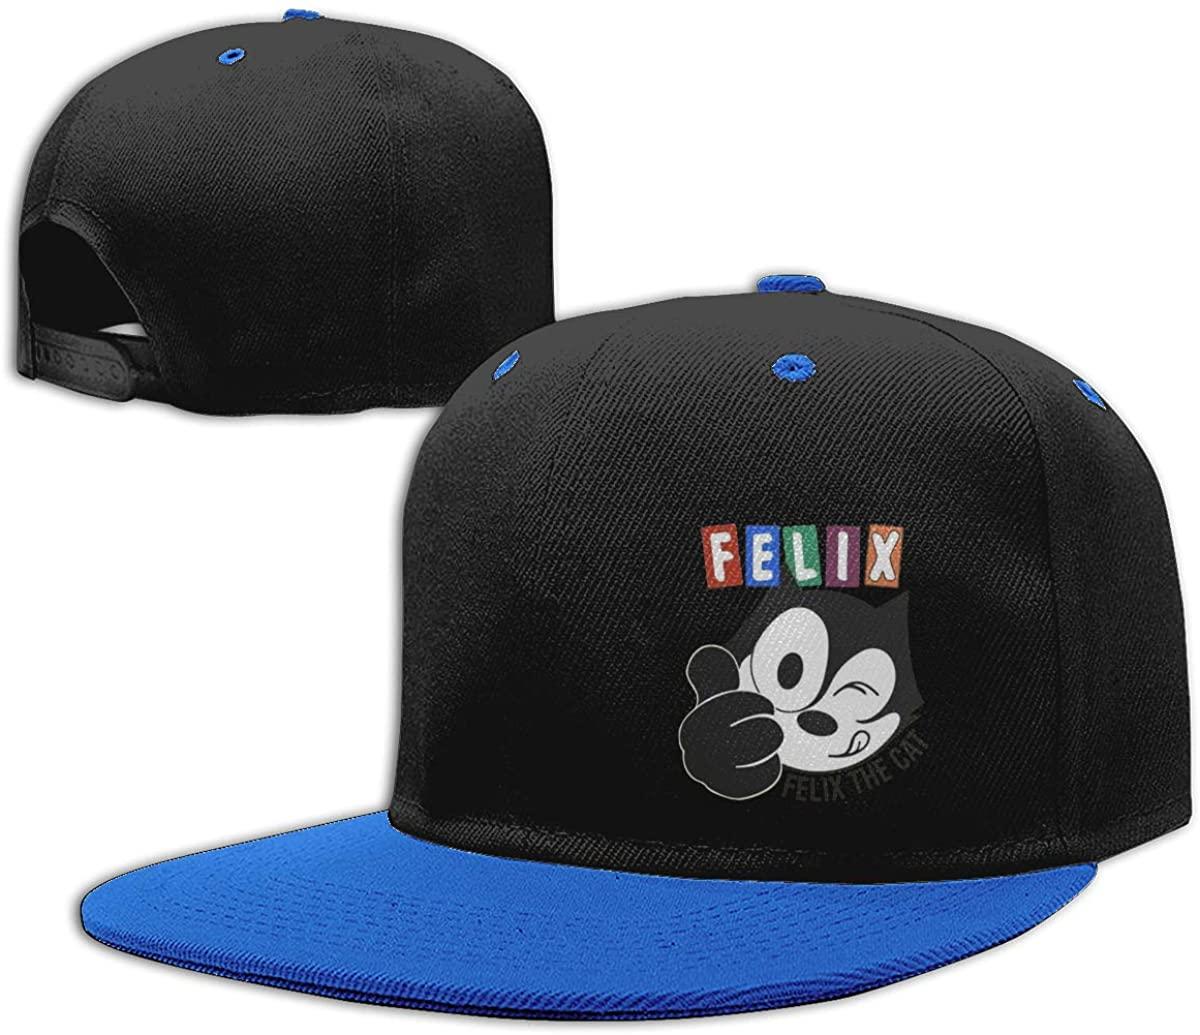 NYF Boys Girls Baseball Cap Snapback Hat Flat Bill Brim Adjustable Trucker Hat for Kids Children